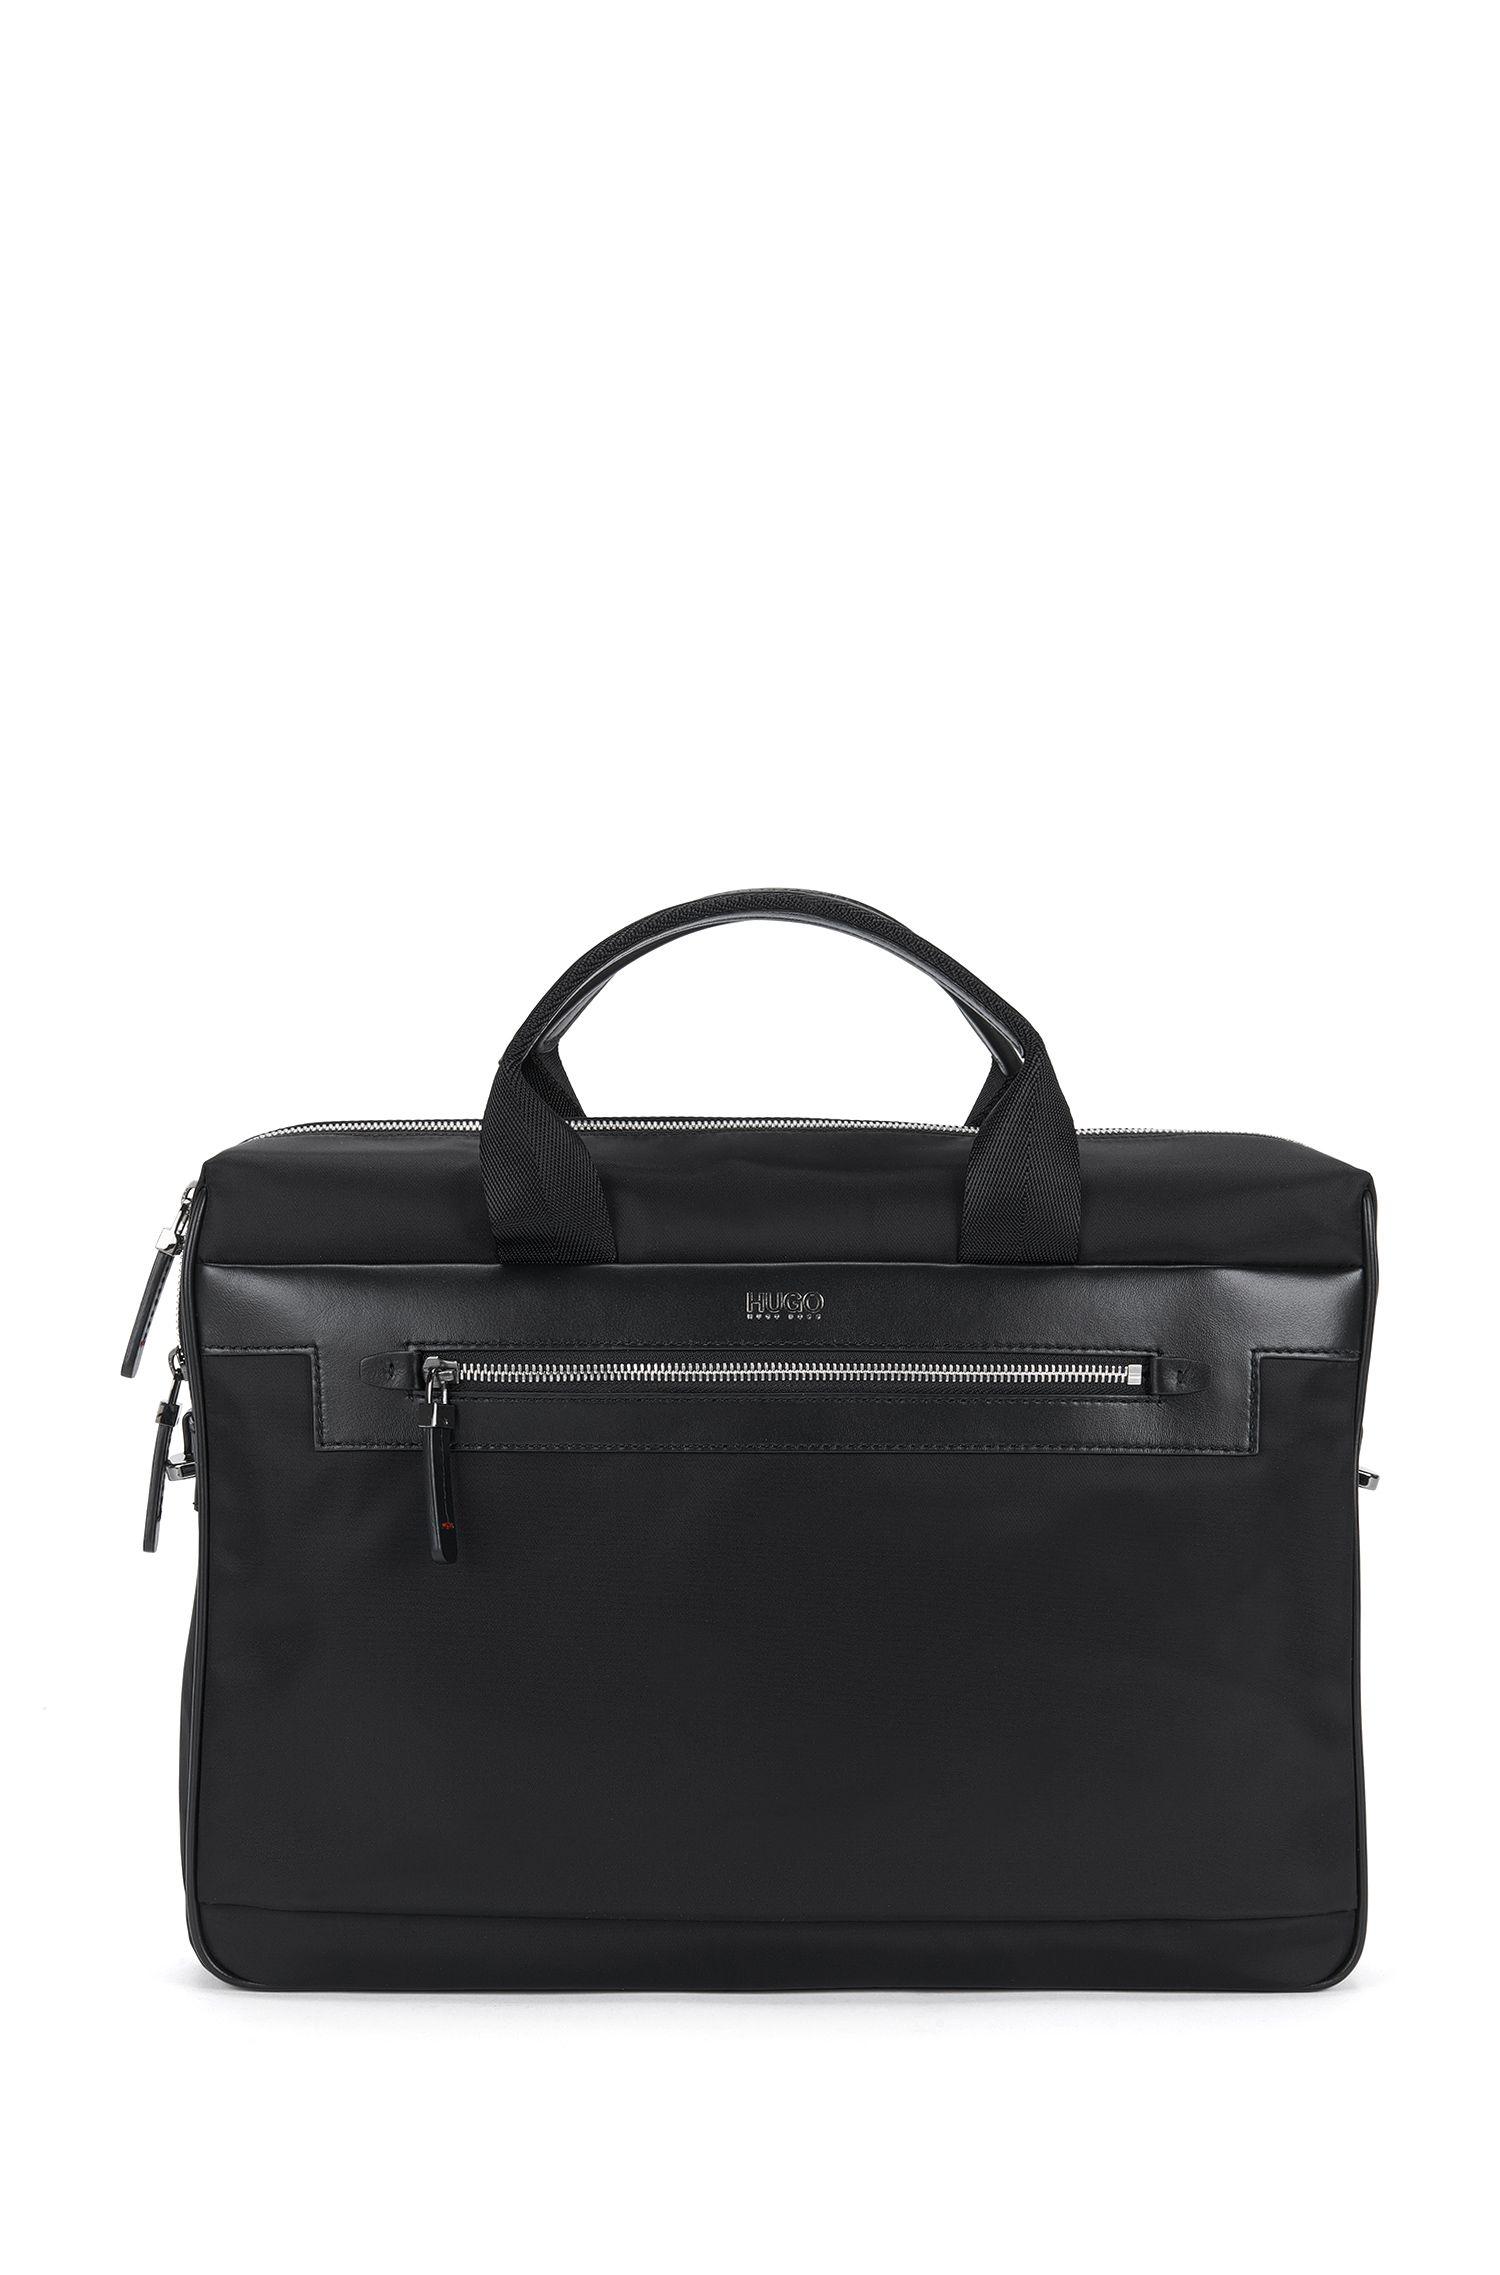 'Digital L S Doc' | Nylon Vegan Leather Workbag, Detachable Shoulder Strap